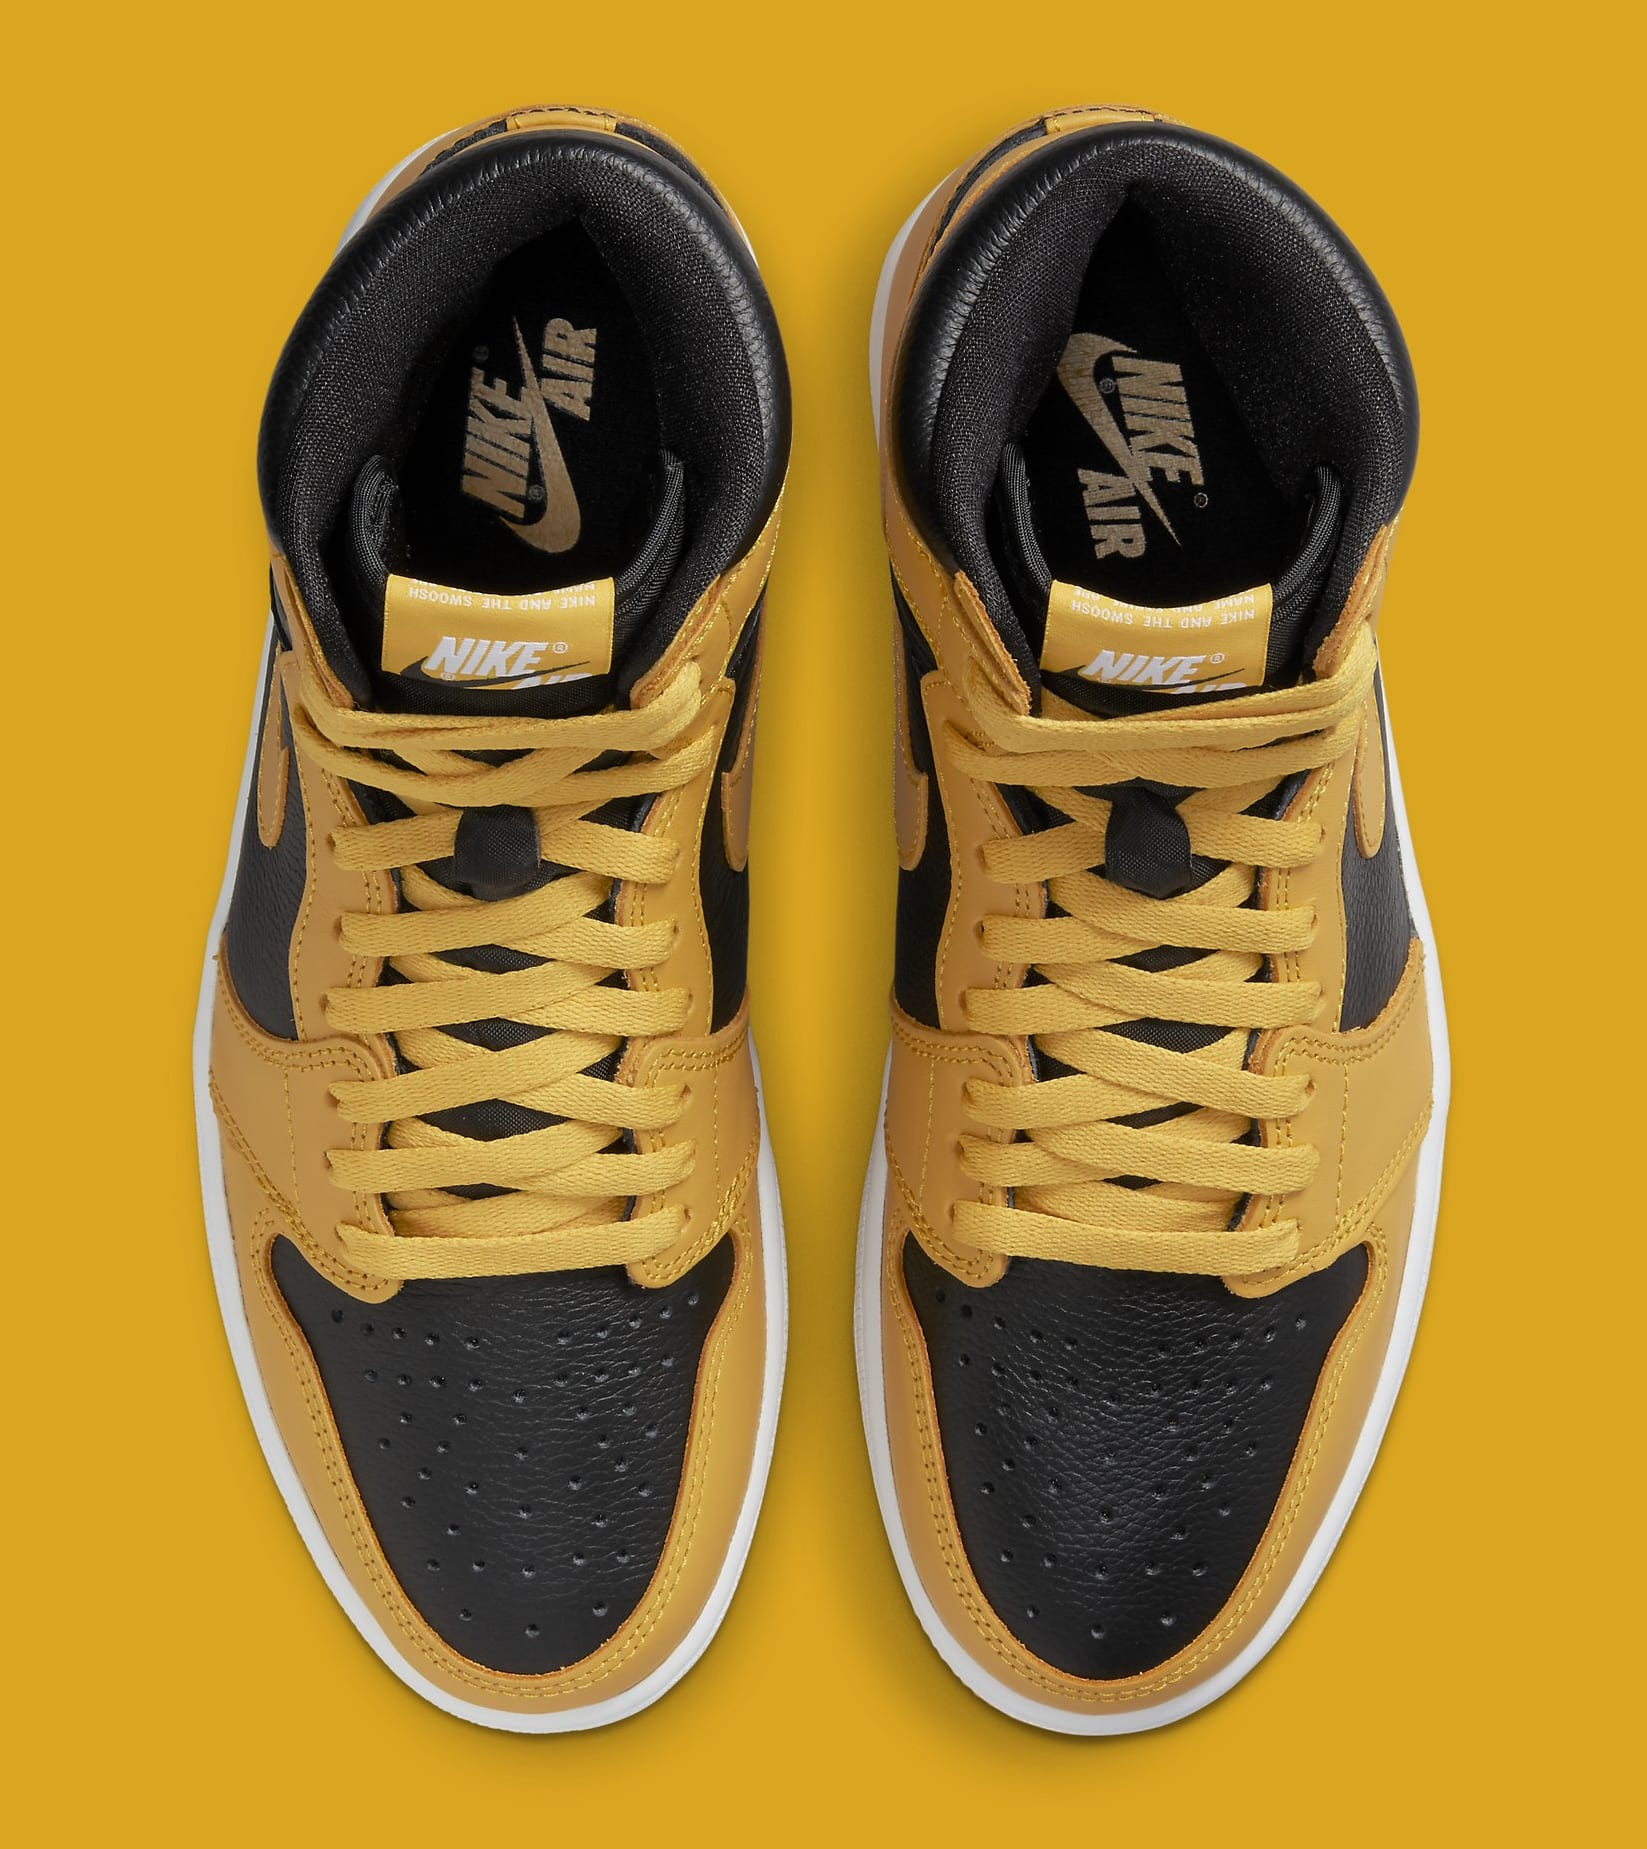 Air Jordan 1 Retro High OG 'Pollen' 555088-701 Top